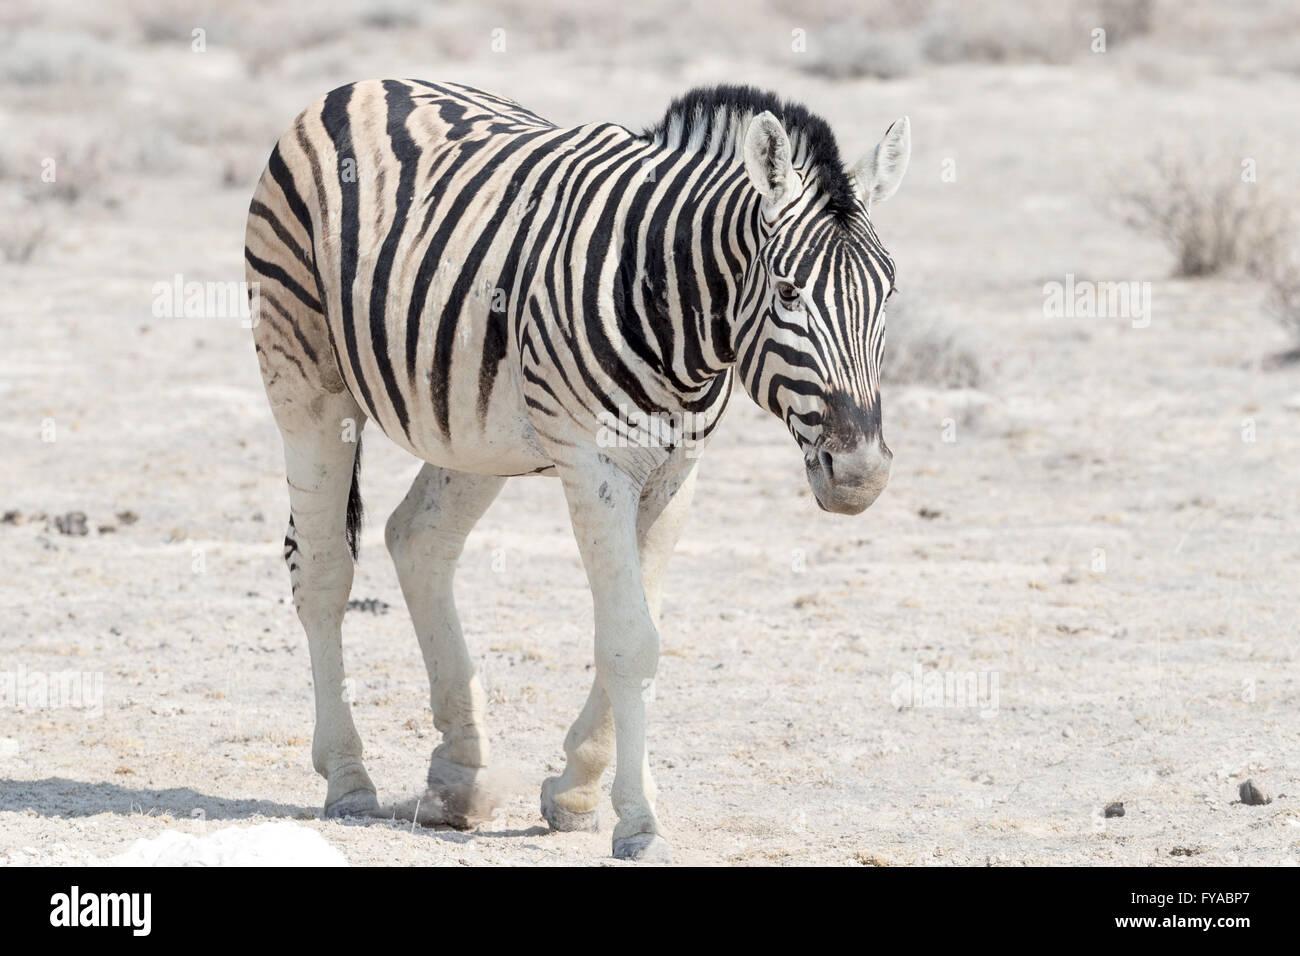 Plain's Zebra Chapman's race walking along the road Etosha National Park Namibia - Stock Image